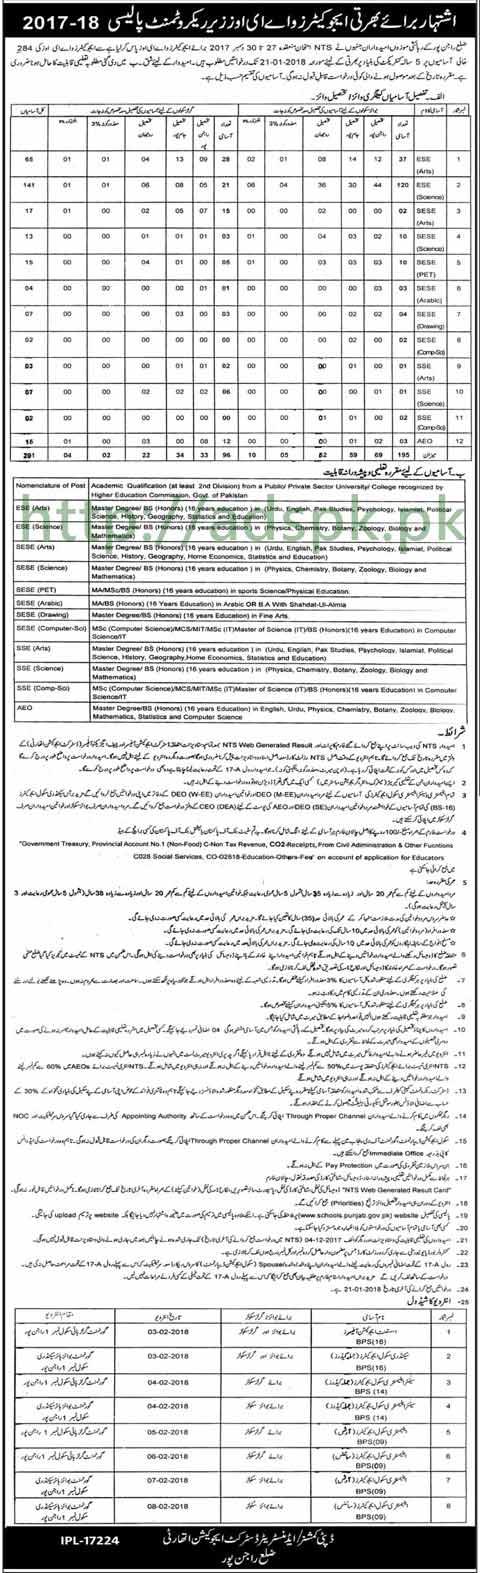 Punjab Educators District Rajanpur Jobs 2018 Interview Schedule Educators AEOs Tehsil wise (291 Vacancies) Jobs Application Deadline 21-01-2018 Apply Now